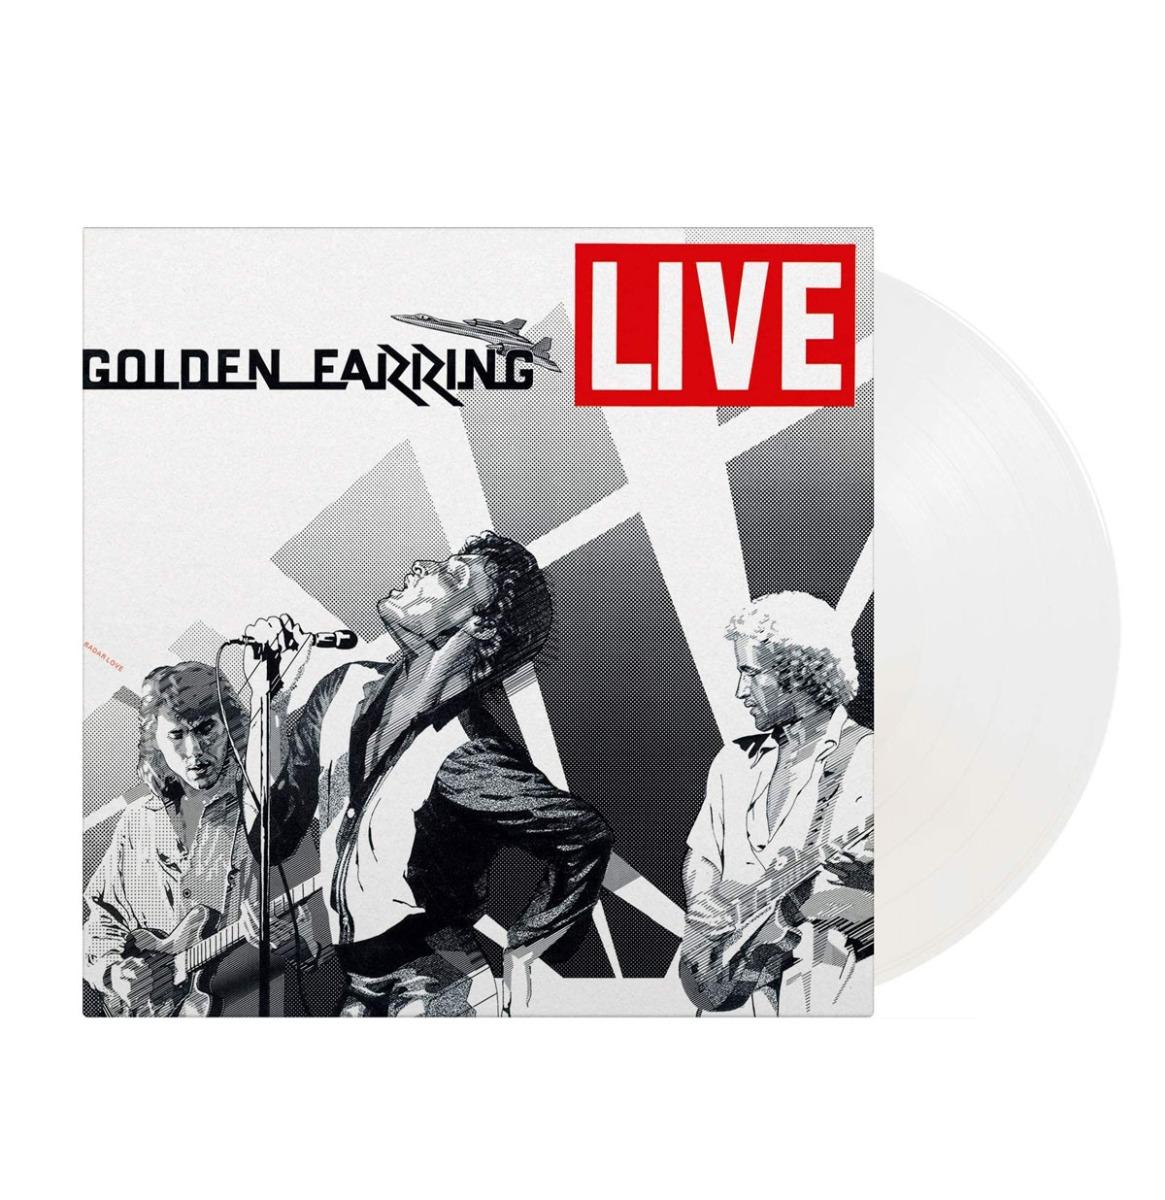 Golden Earring - Live Limited Edition White Vinyl 2 LP